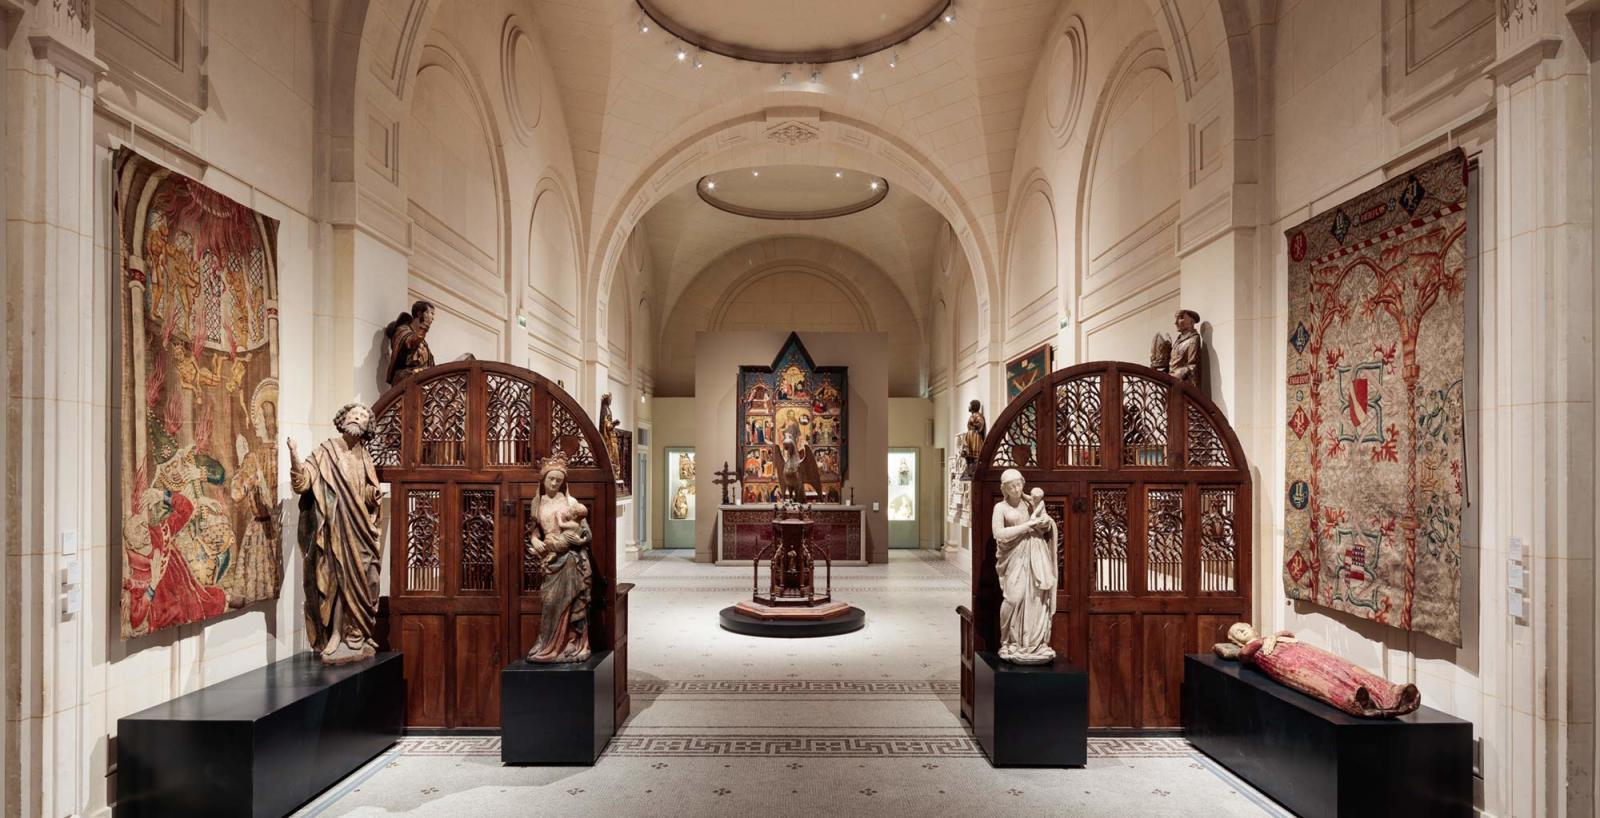 Museè Les Arts Decoratifs